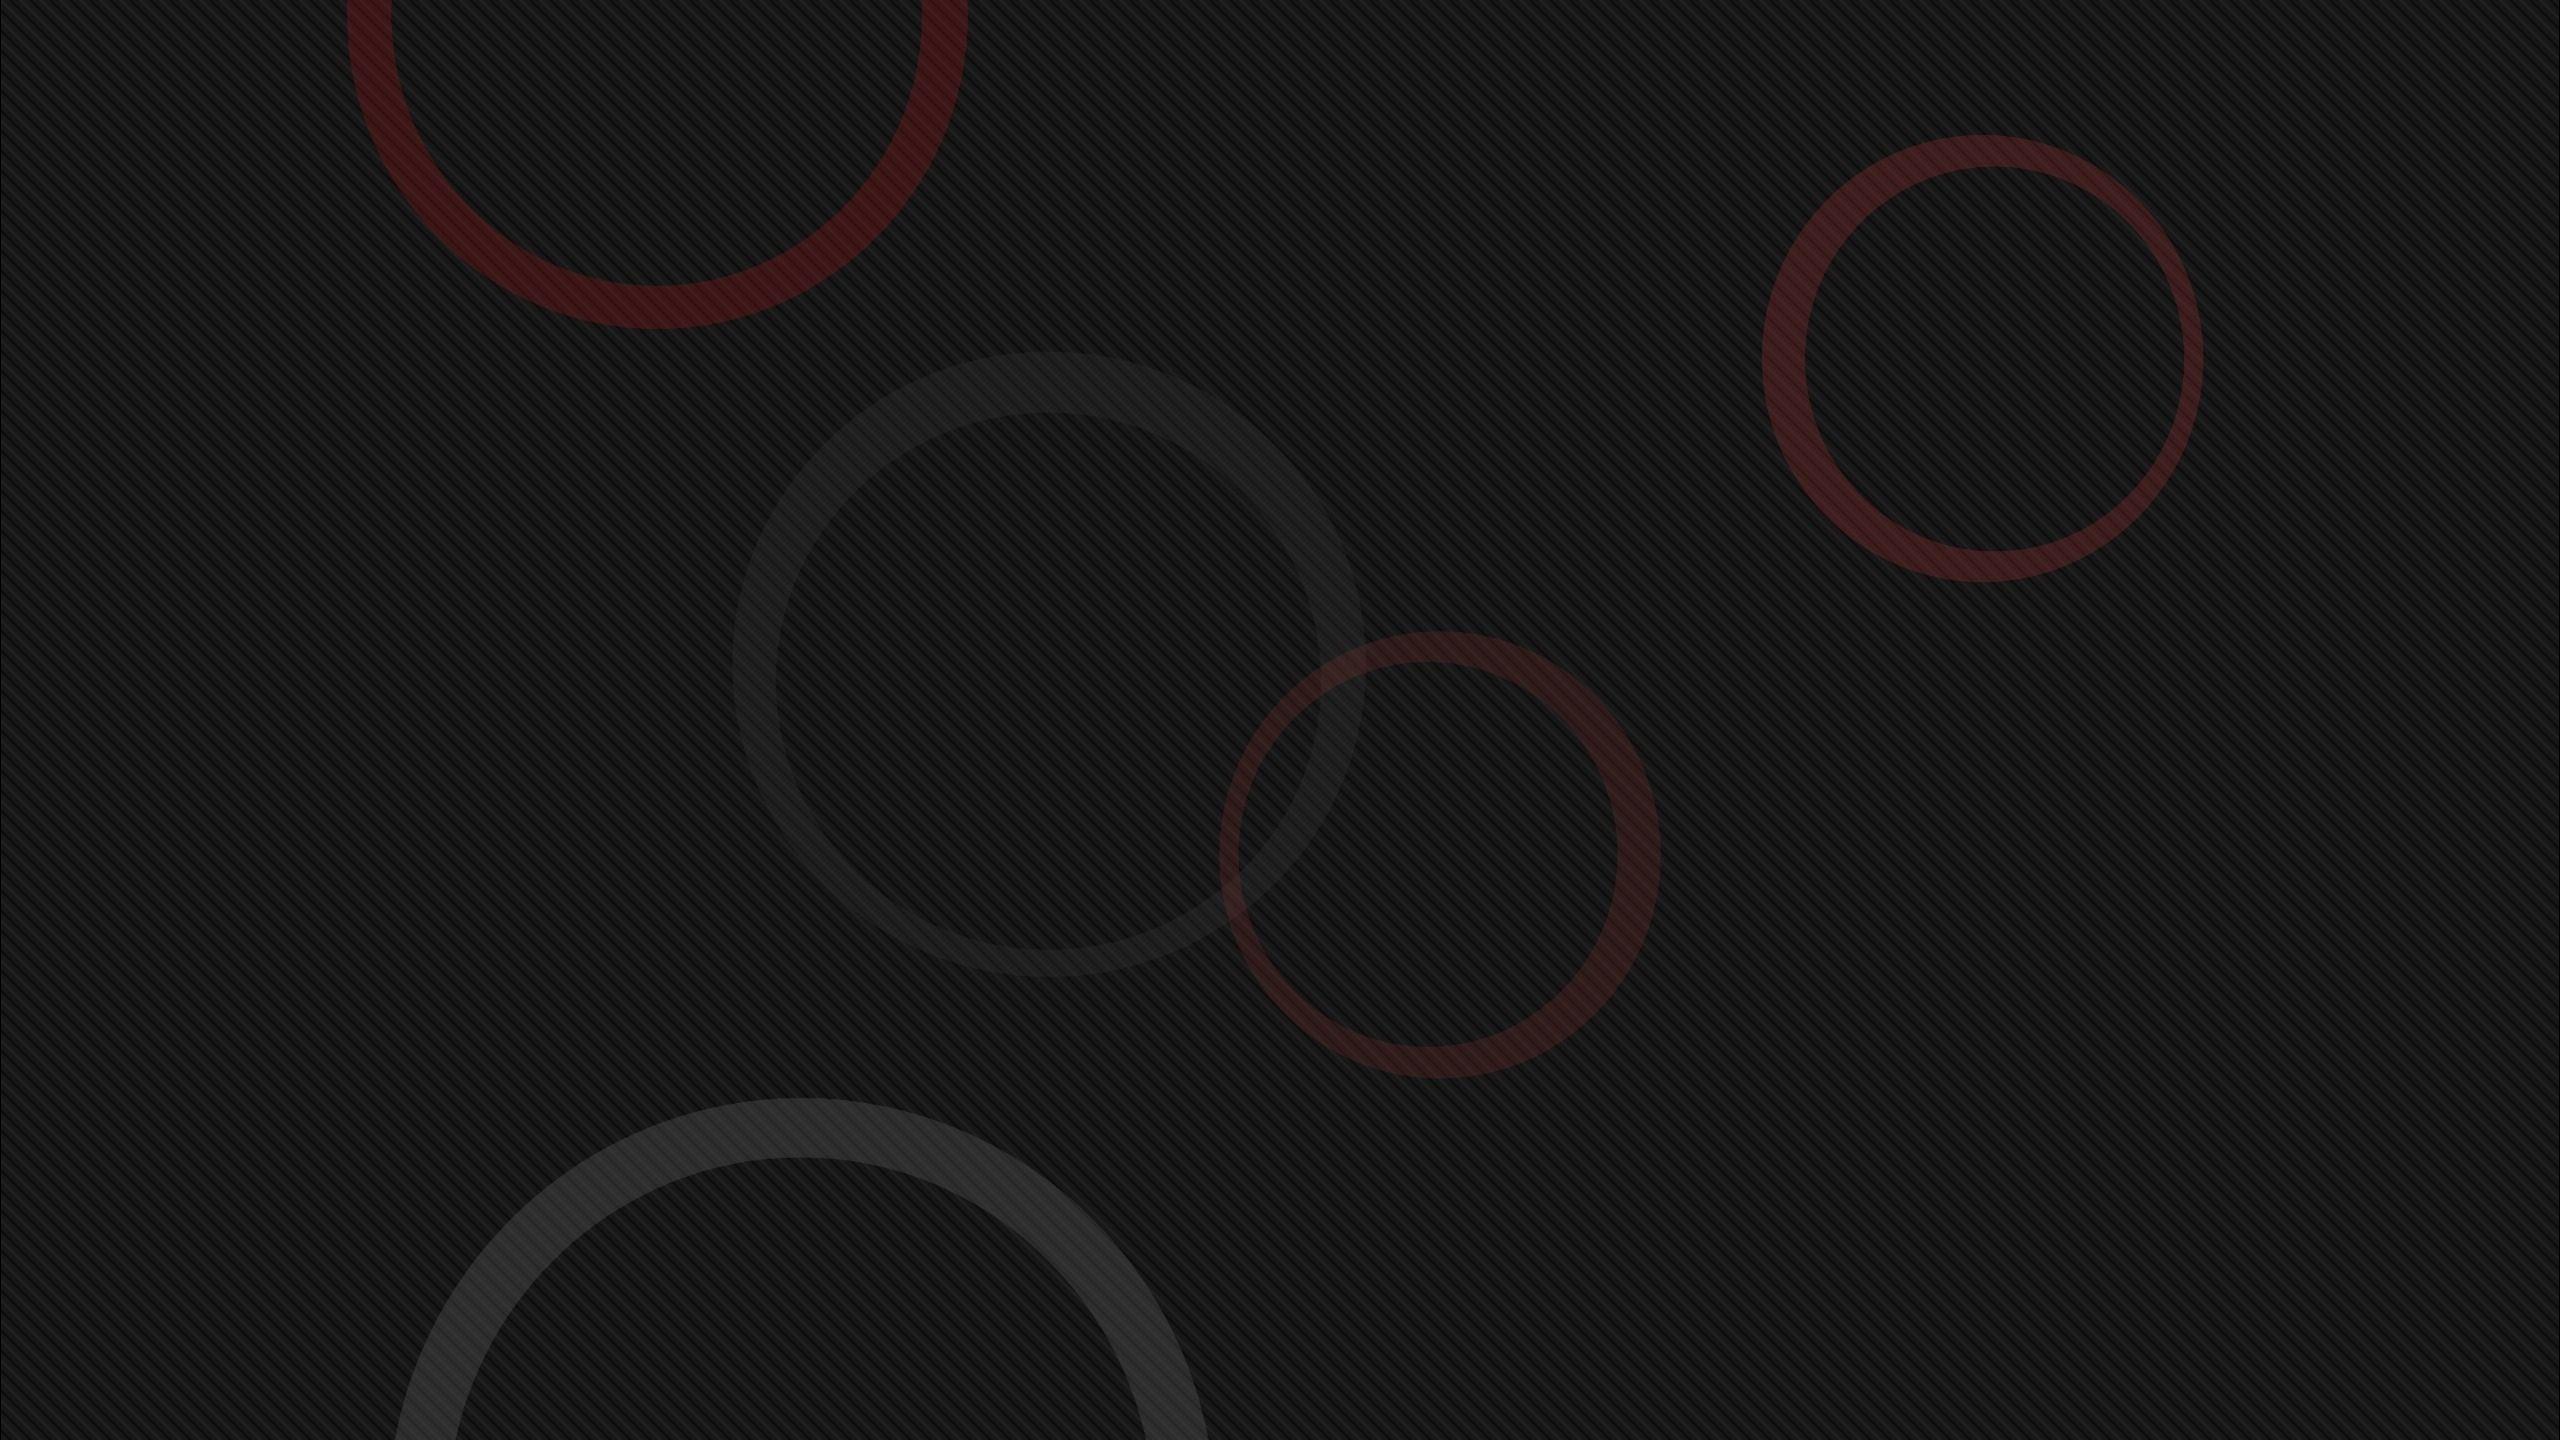 Download Red and gray circles wallpaper 2560x1440